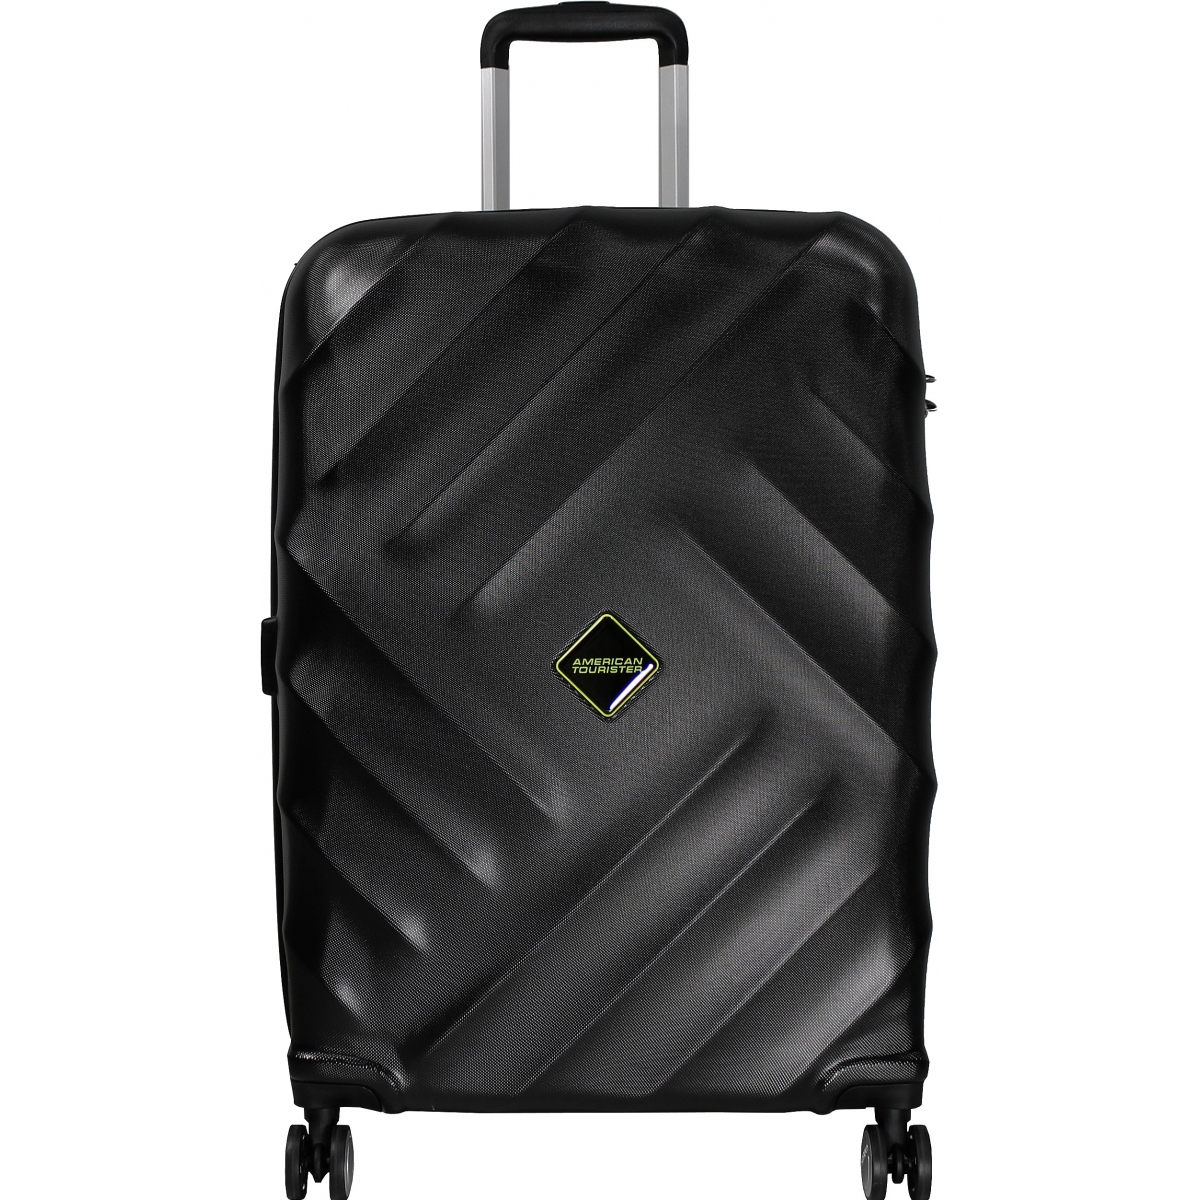 valise crystal glow spinner 66 24 tsa american tourister. Black Bedroom Furniture Sets. Home Design Ideas